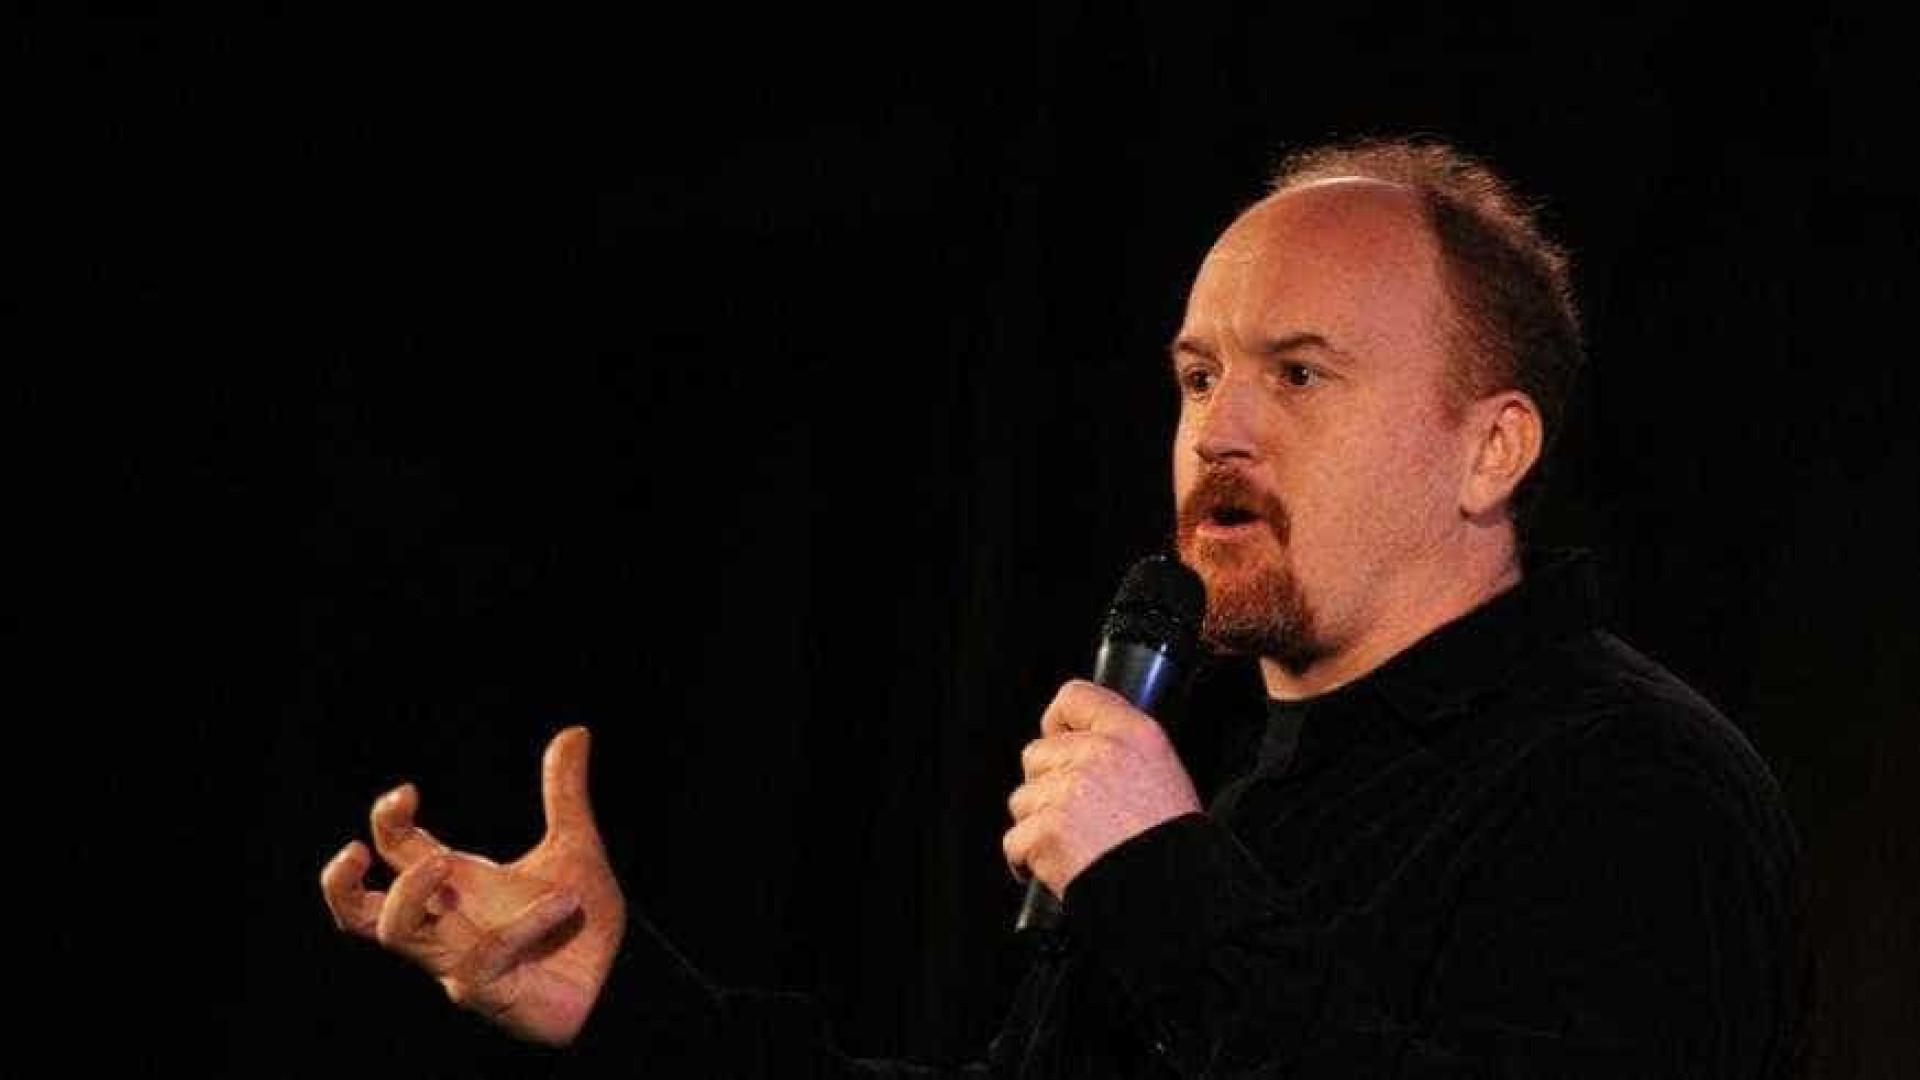 Prestigiado comediante Louis CK é acusado de assédio sexual por cinco mulheres